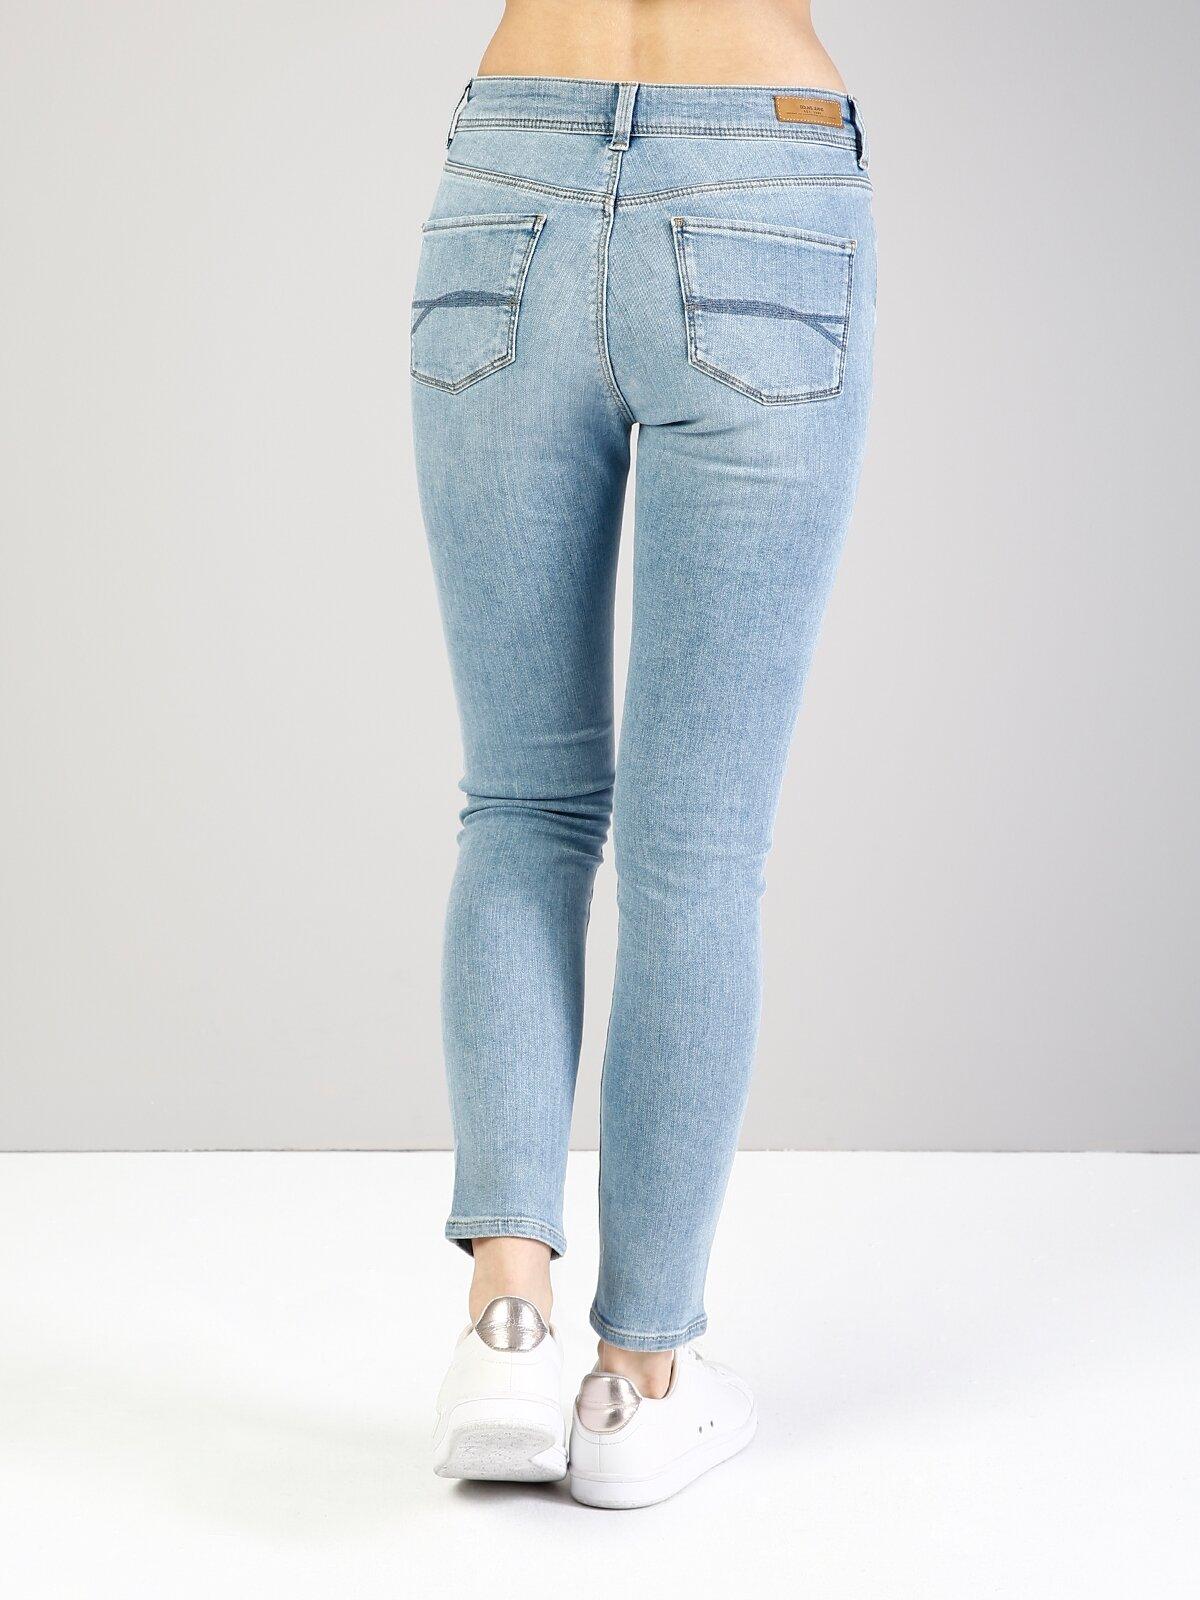 759 Lara Orta Bel Dar Paça Super Slim Fit Mavi Kadın Jean Pantolon